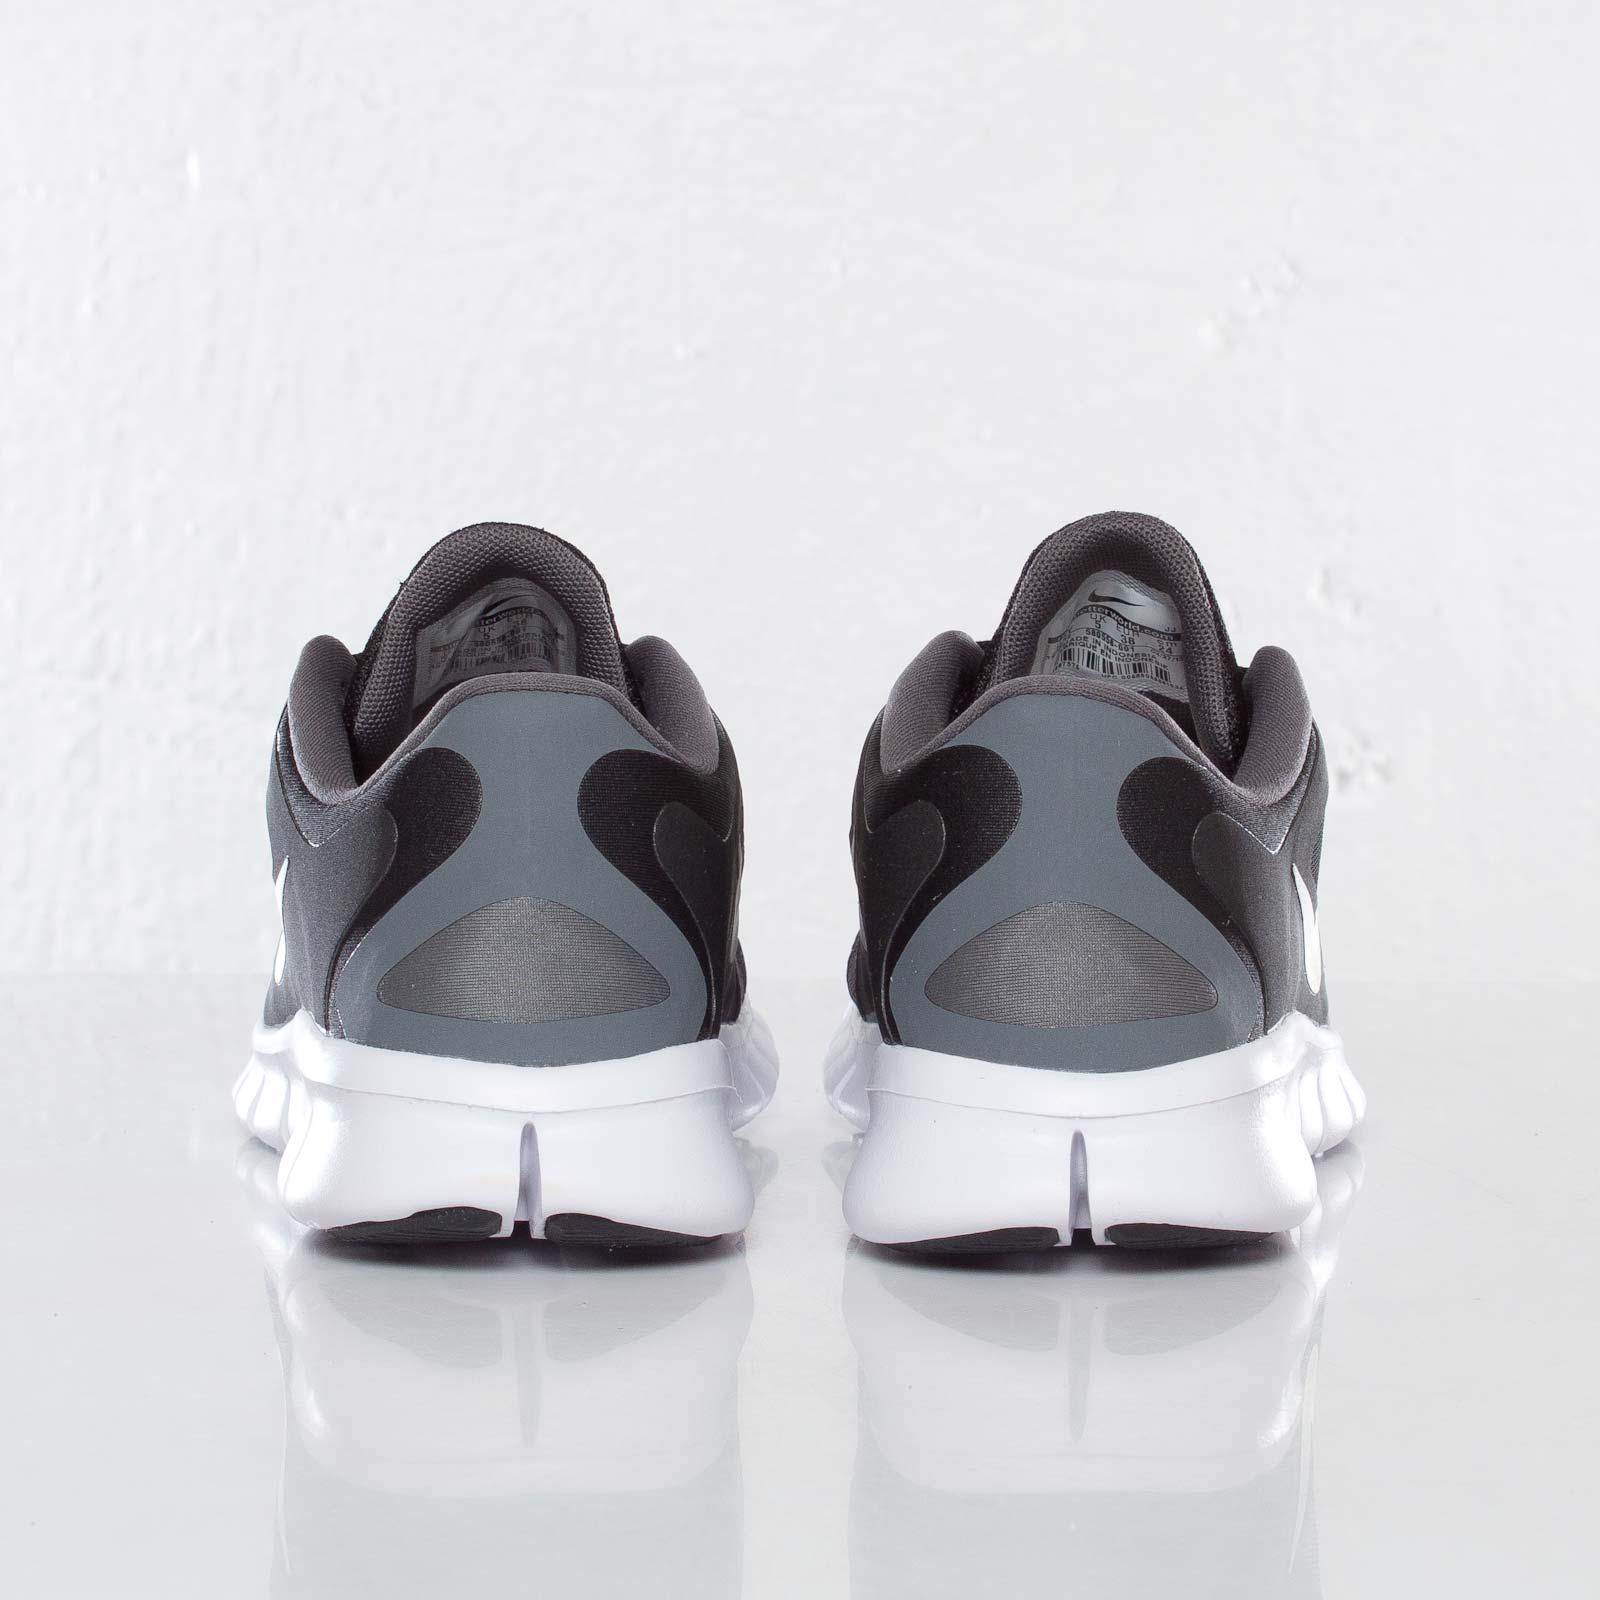 timeless design fc623 4dbe3 Nike Free 5.0 (GS) - 580558-001 - Sneakersnstuff | sneakers ...